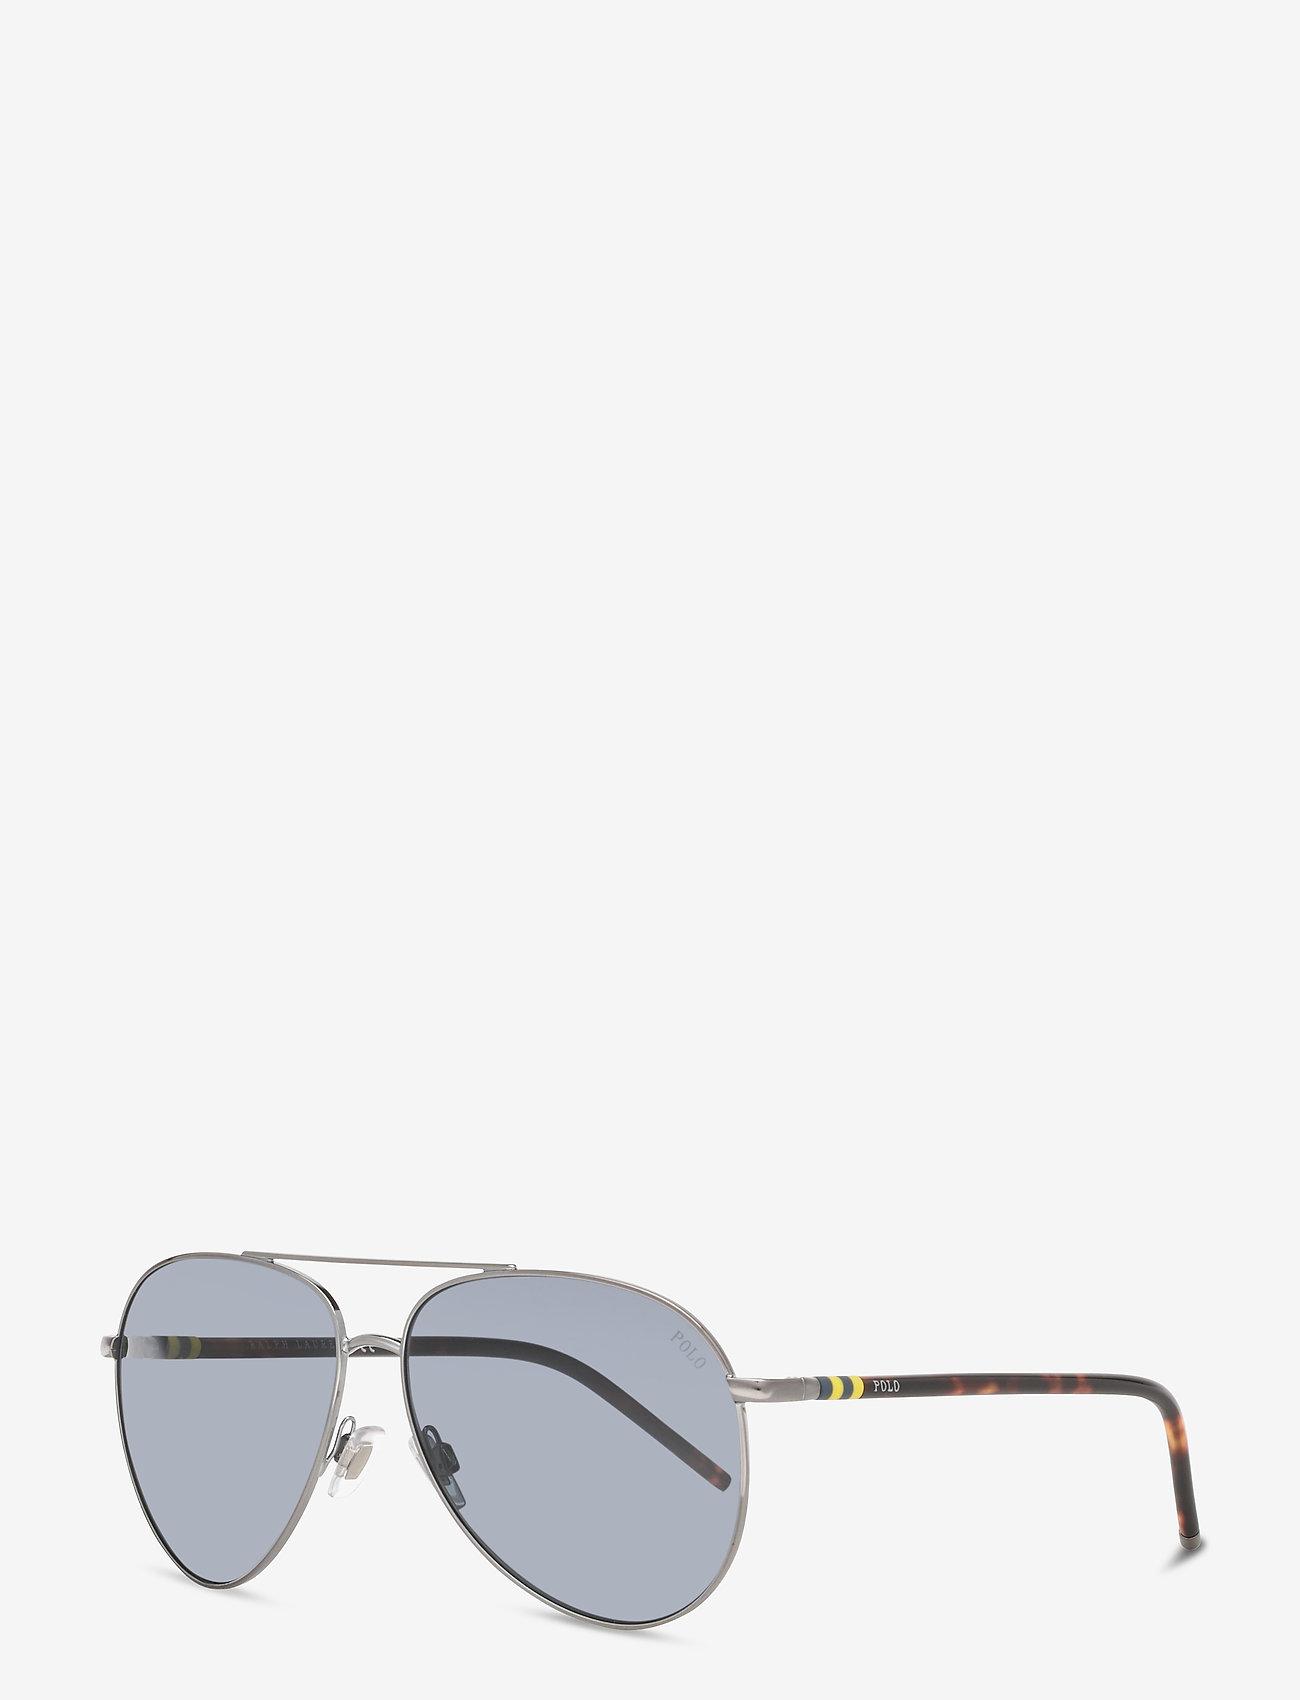 Polo Ralph Lauren - Sunglasses - pilot - grey/blue - 1